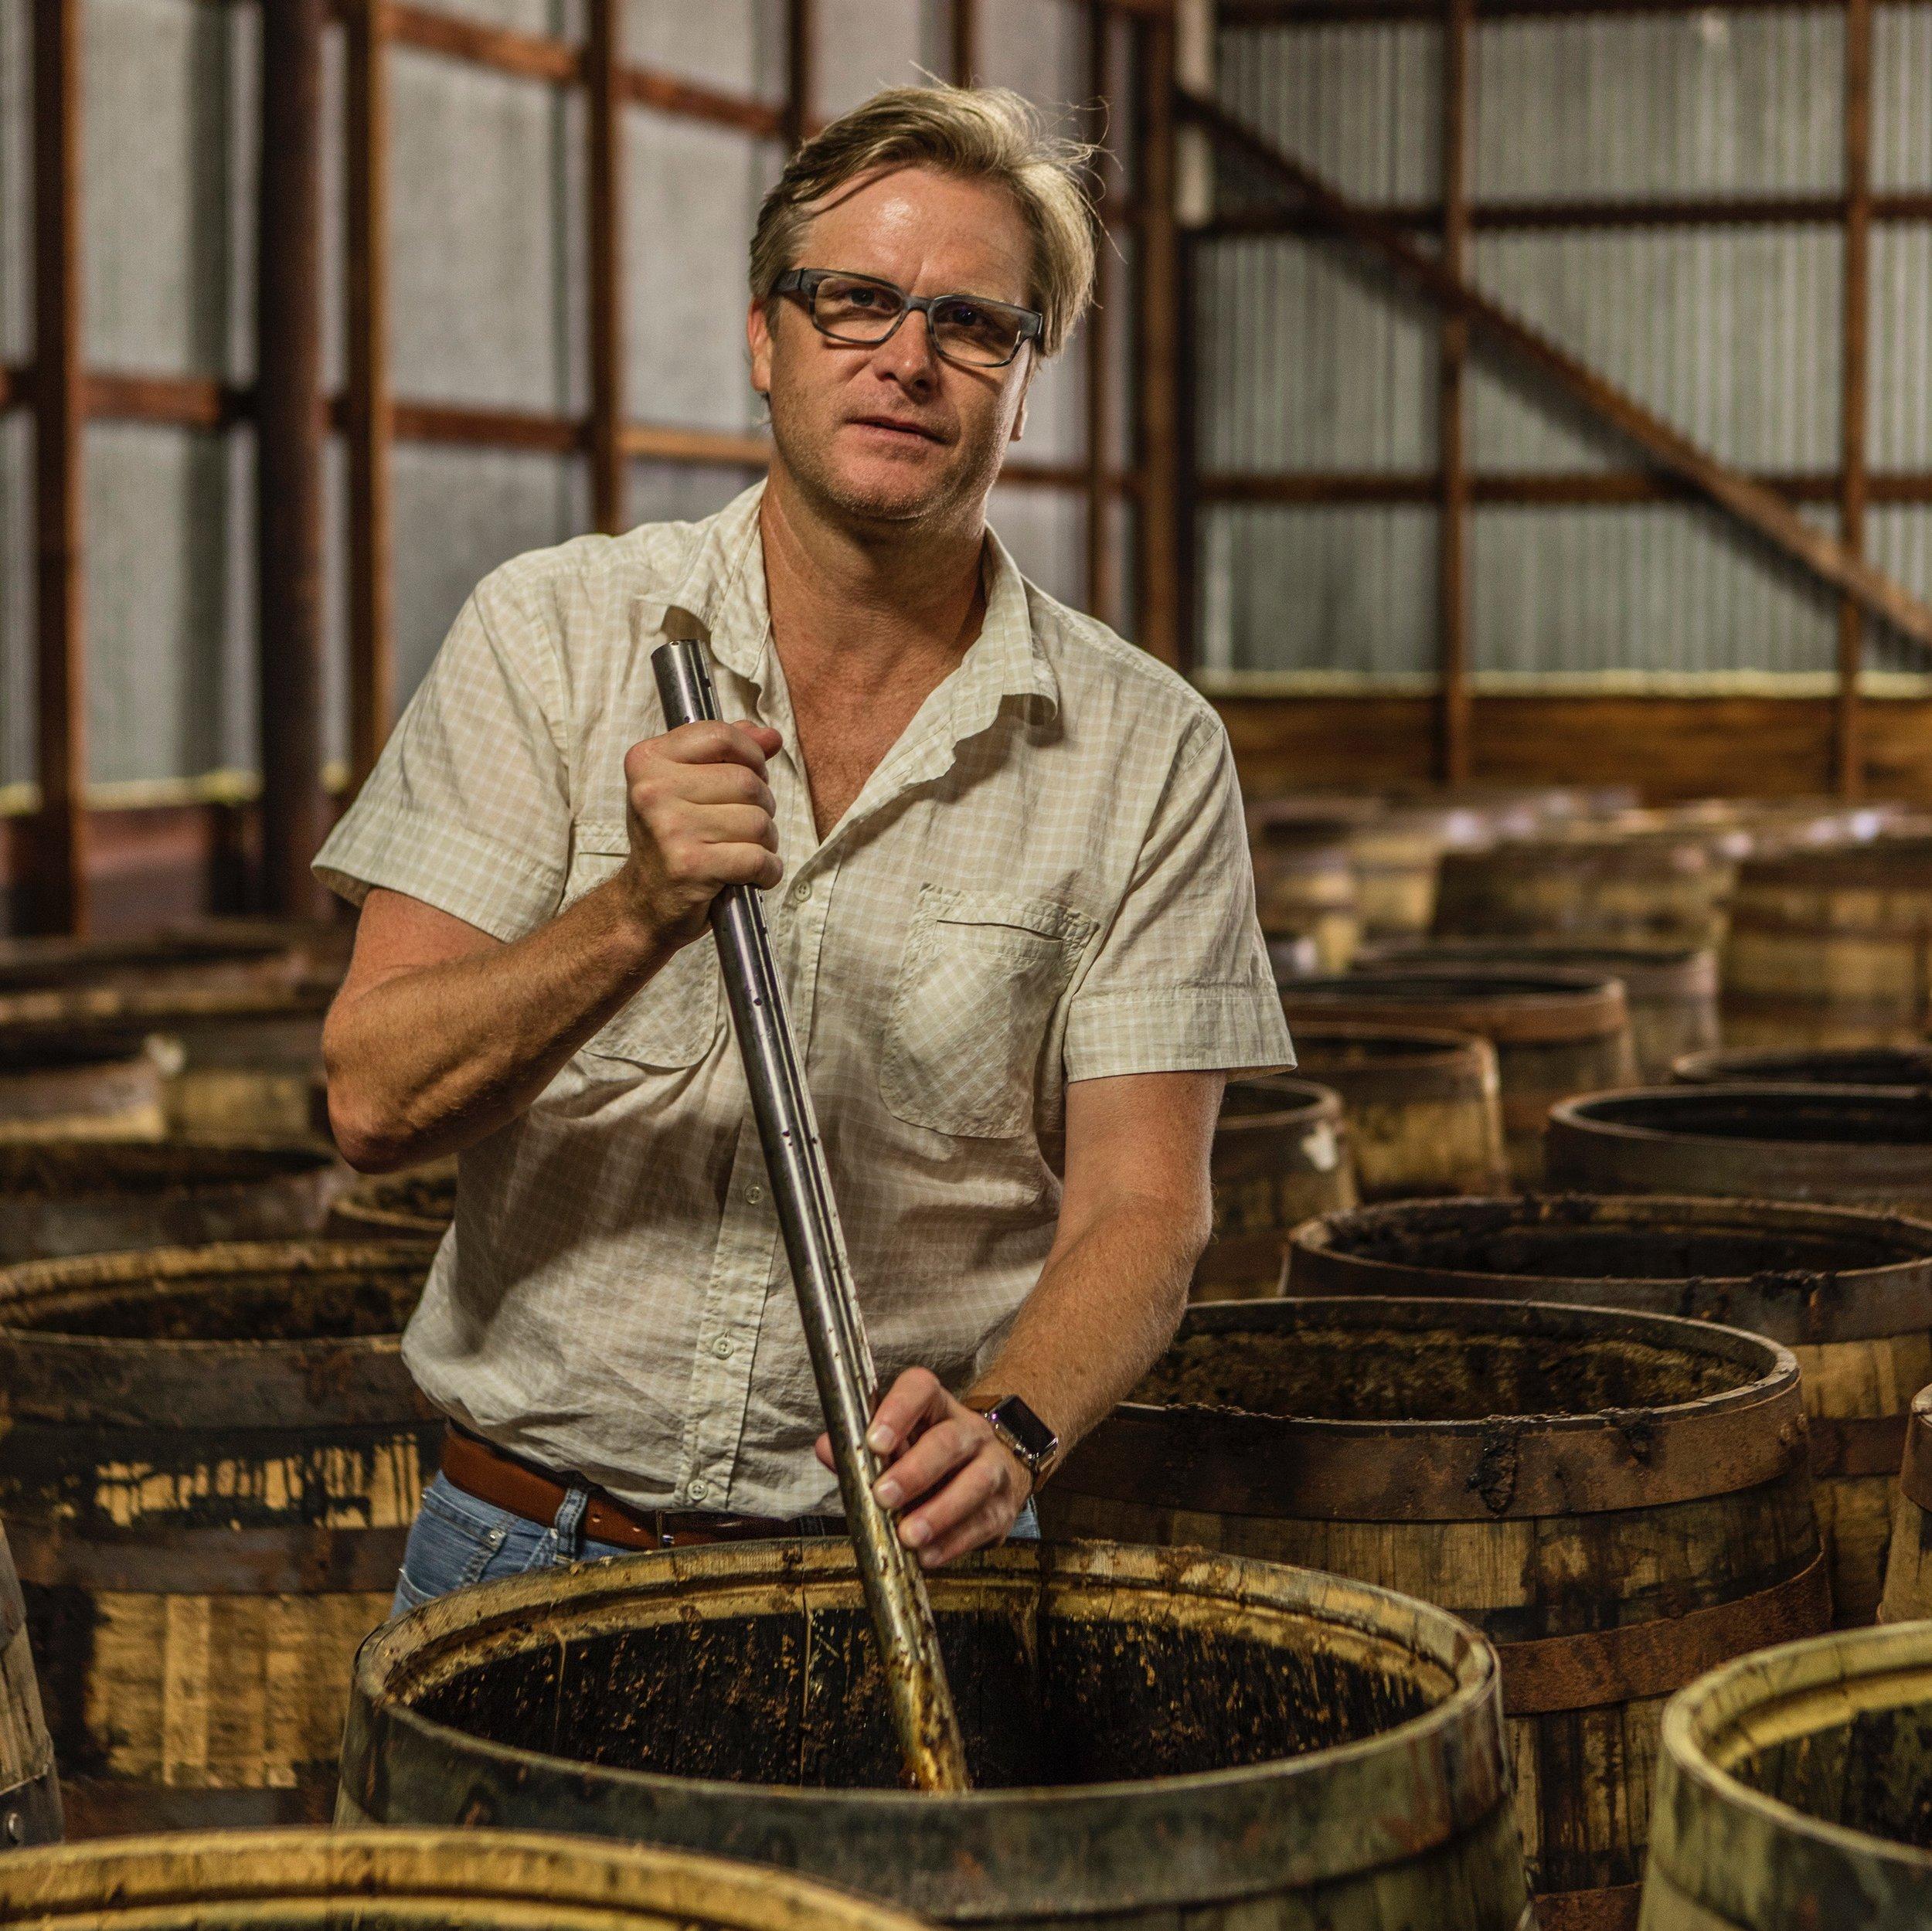 photos: bourbon barrel foods